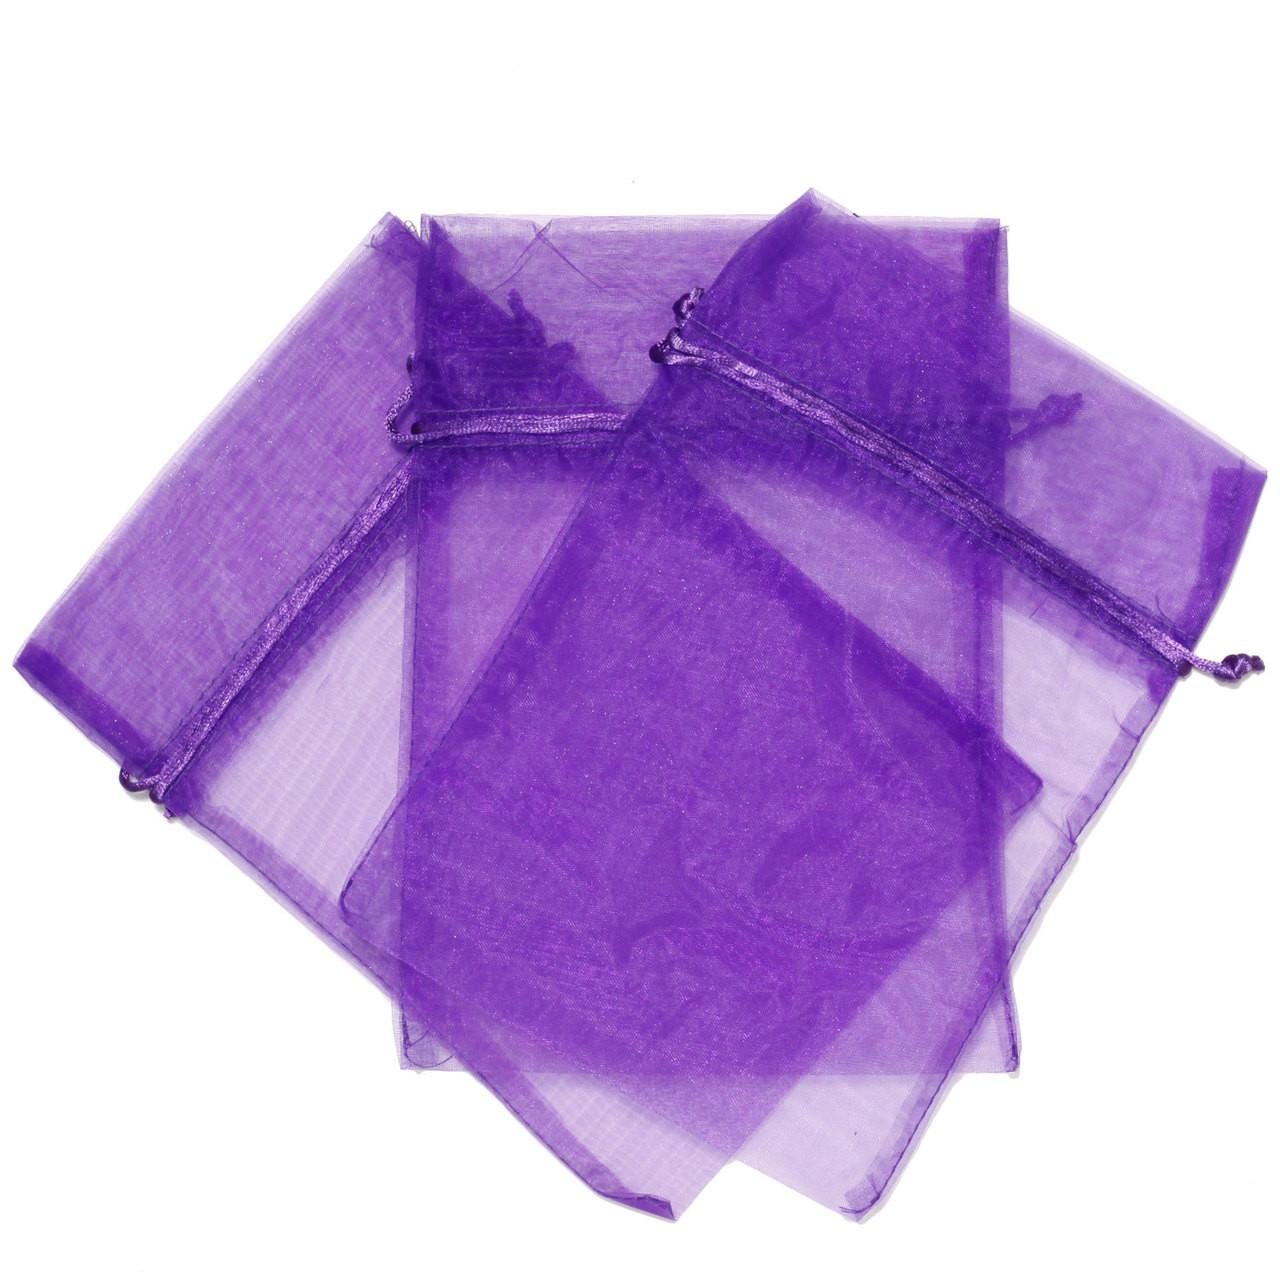 dirt cheap uk store promo code Purple Organza Gift Bag - Small